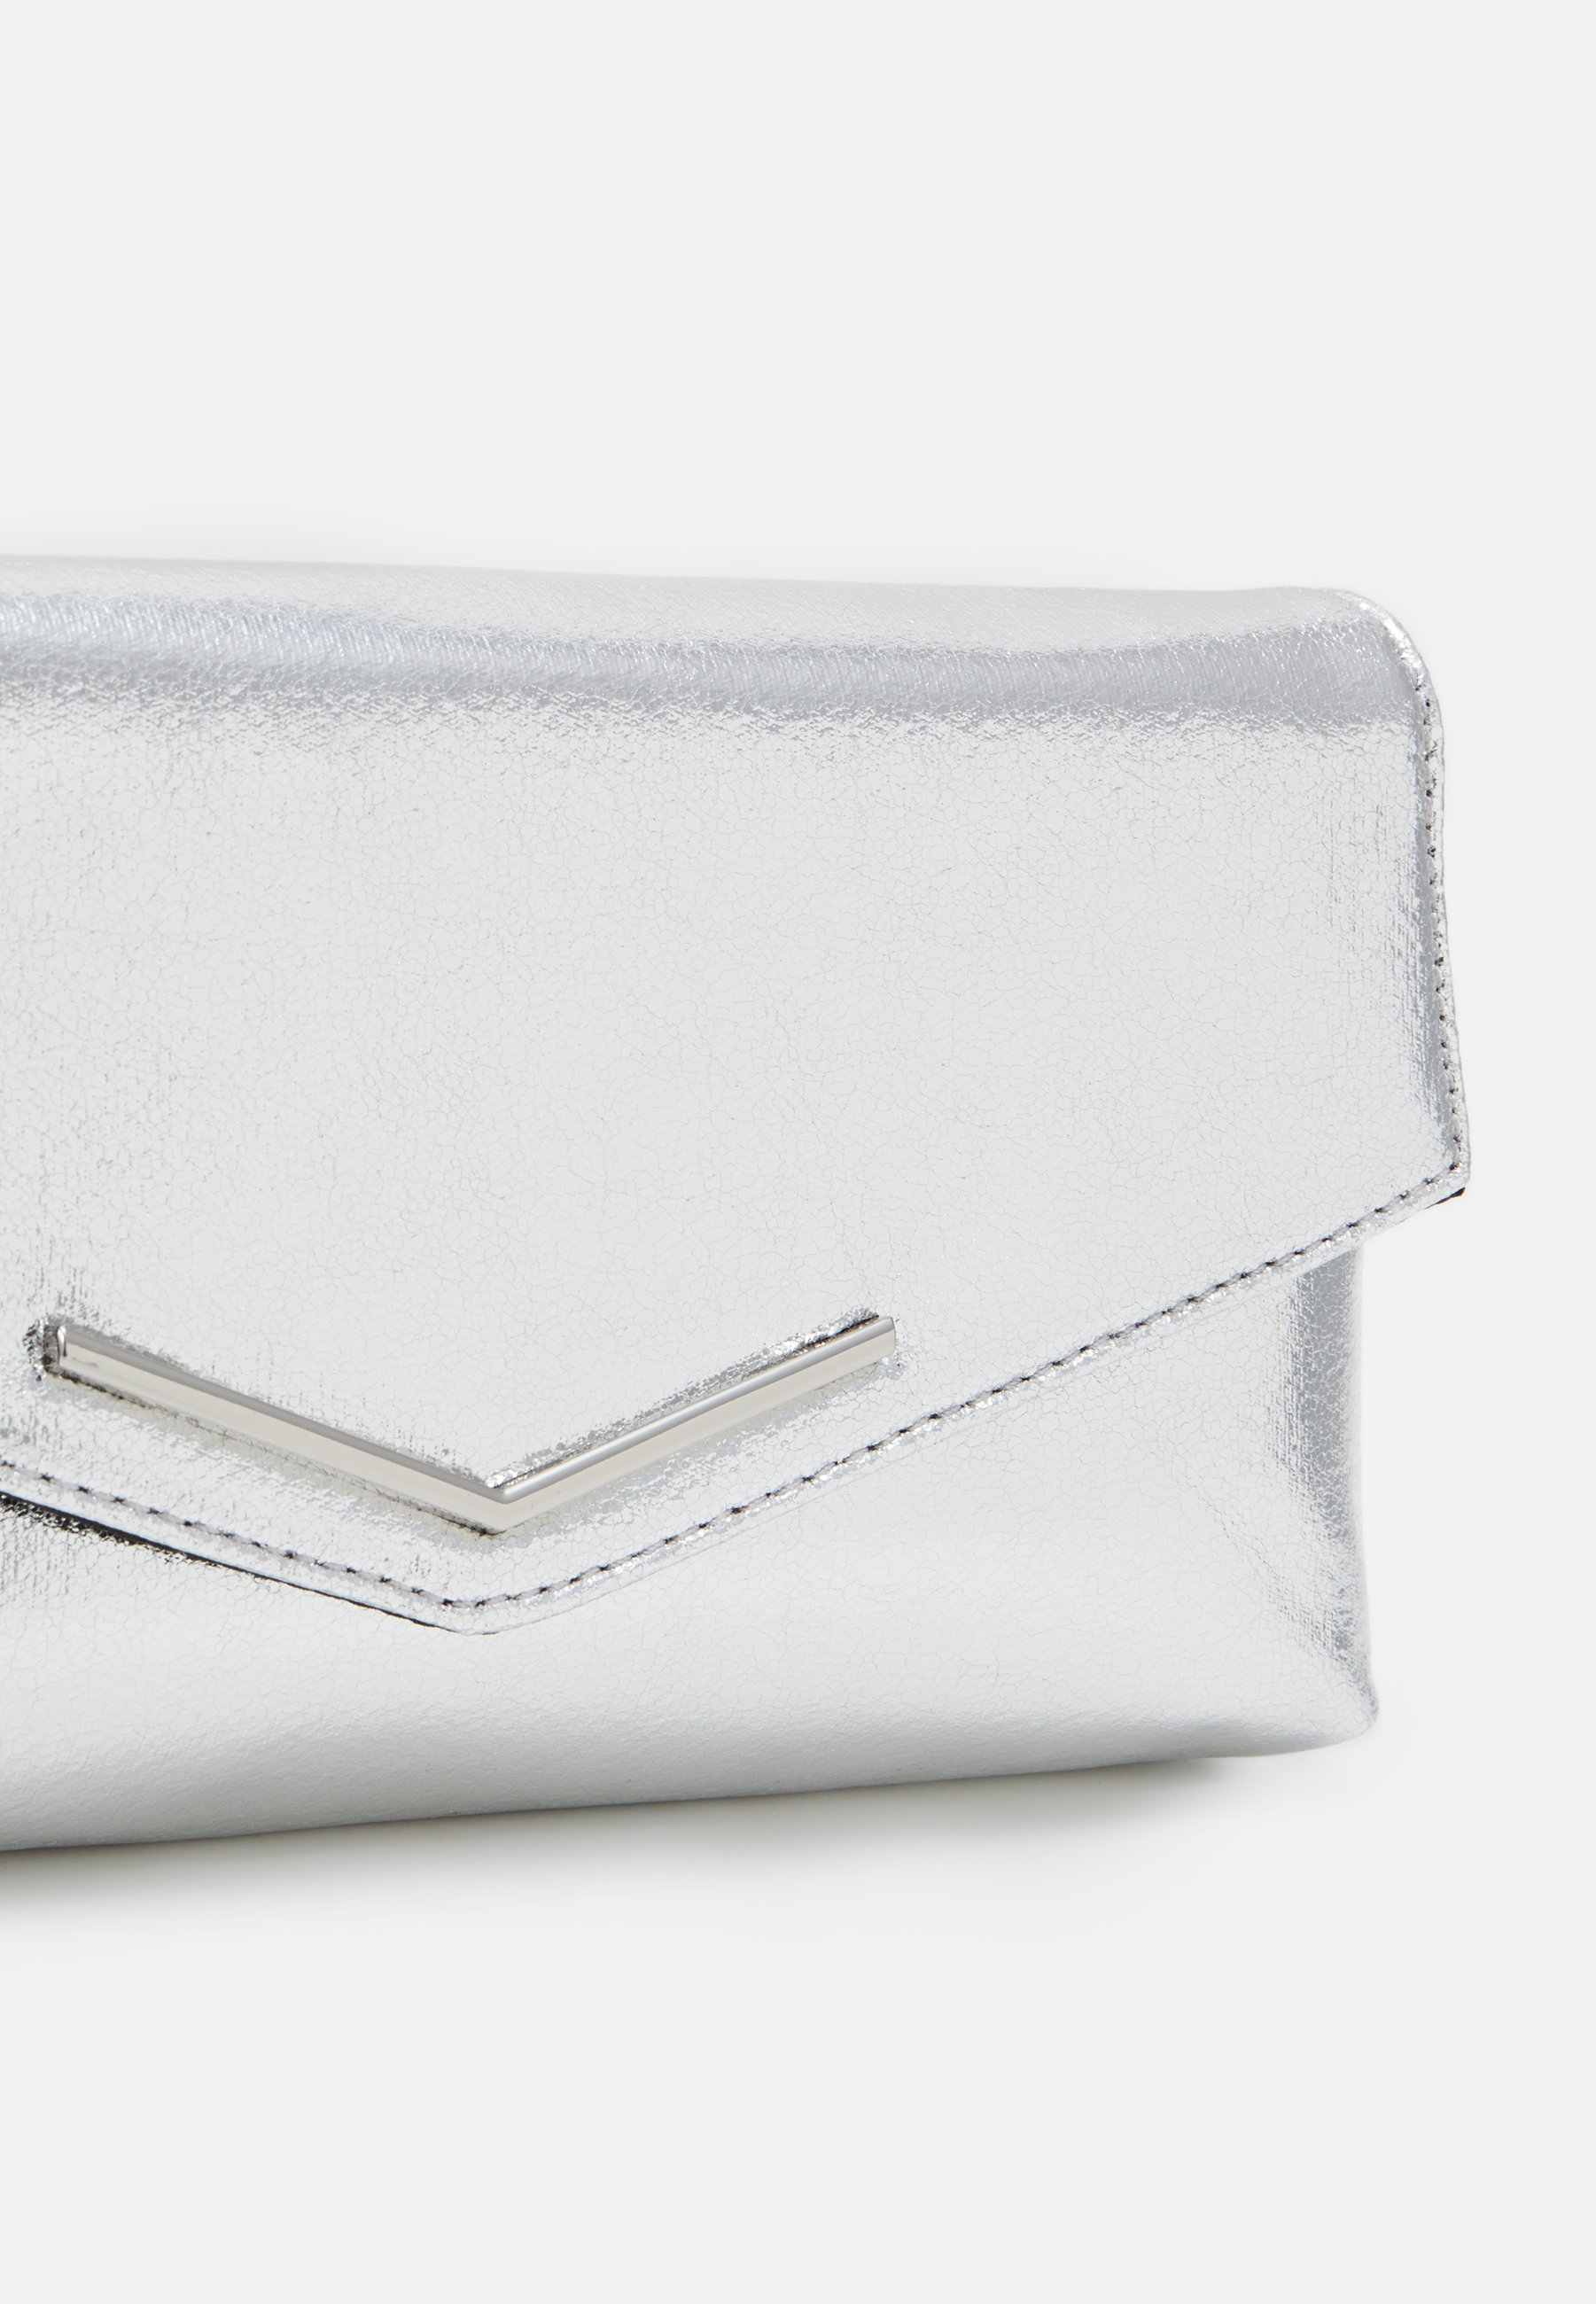 Dorothy Perkins BAR - Clutch - silver/sølv tbuXePtbjPfQ7WQ